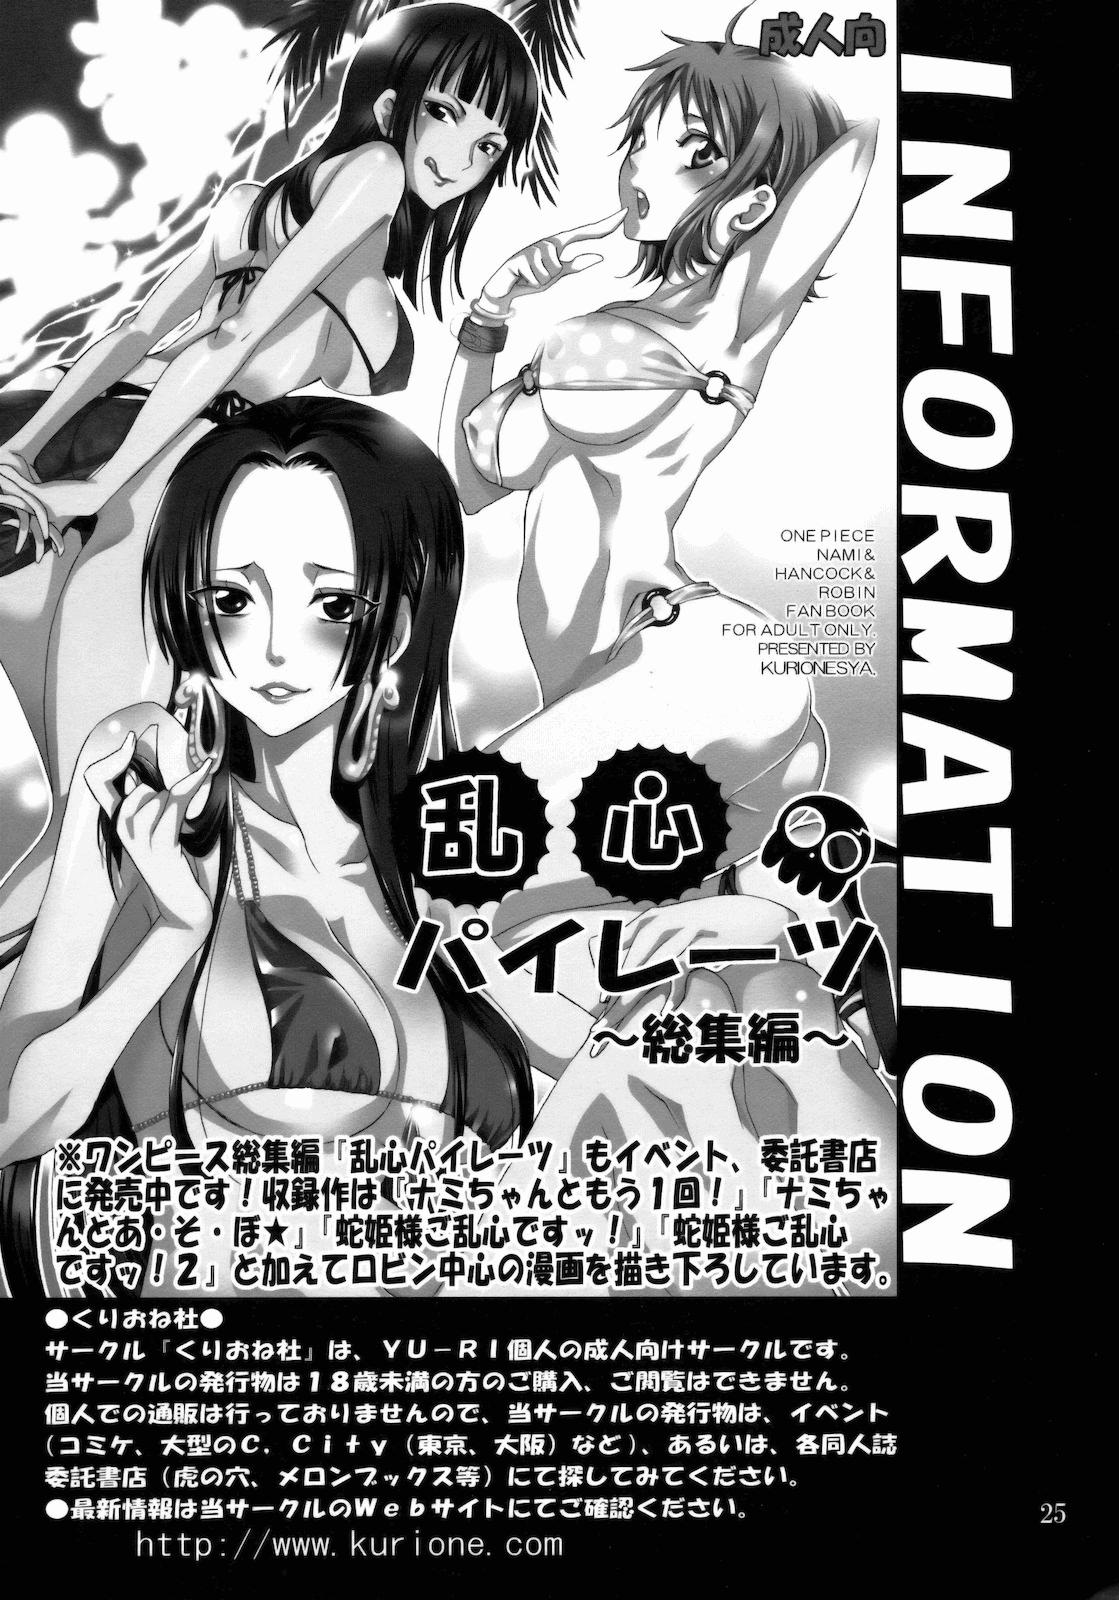 Kaizokuou no Yome ni Warawa wa Naru! | I'll be the wife of the Pirate King! 23